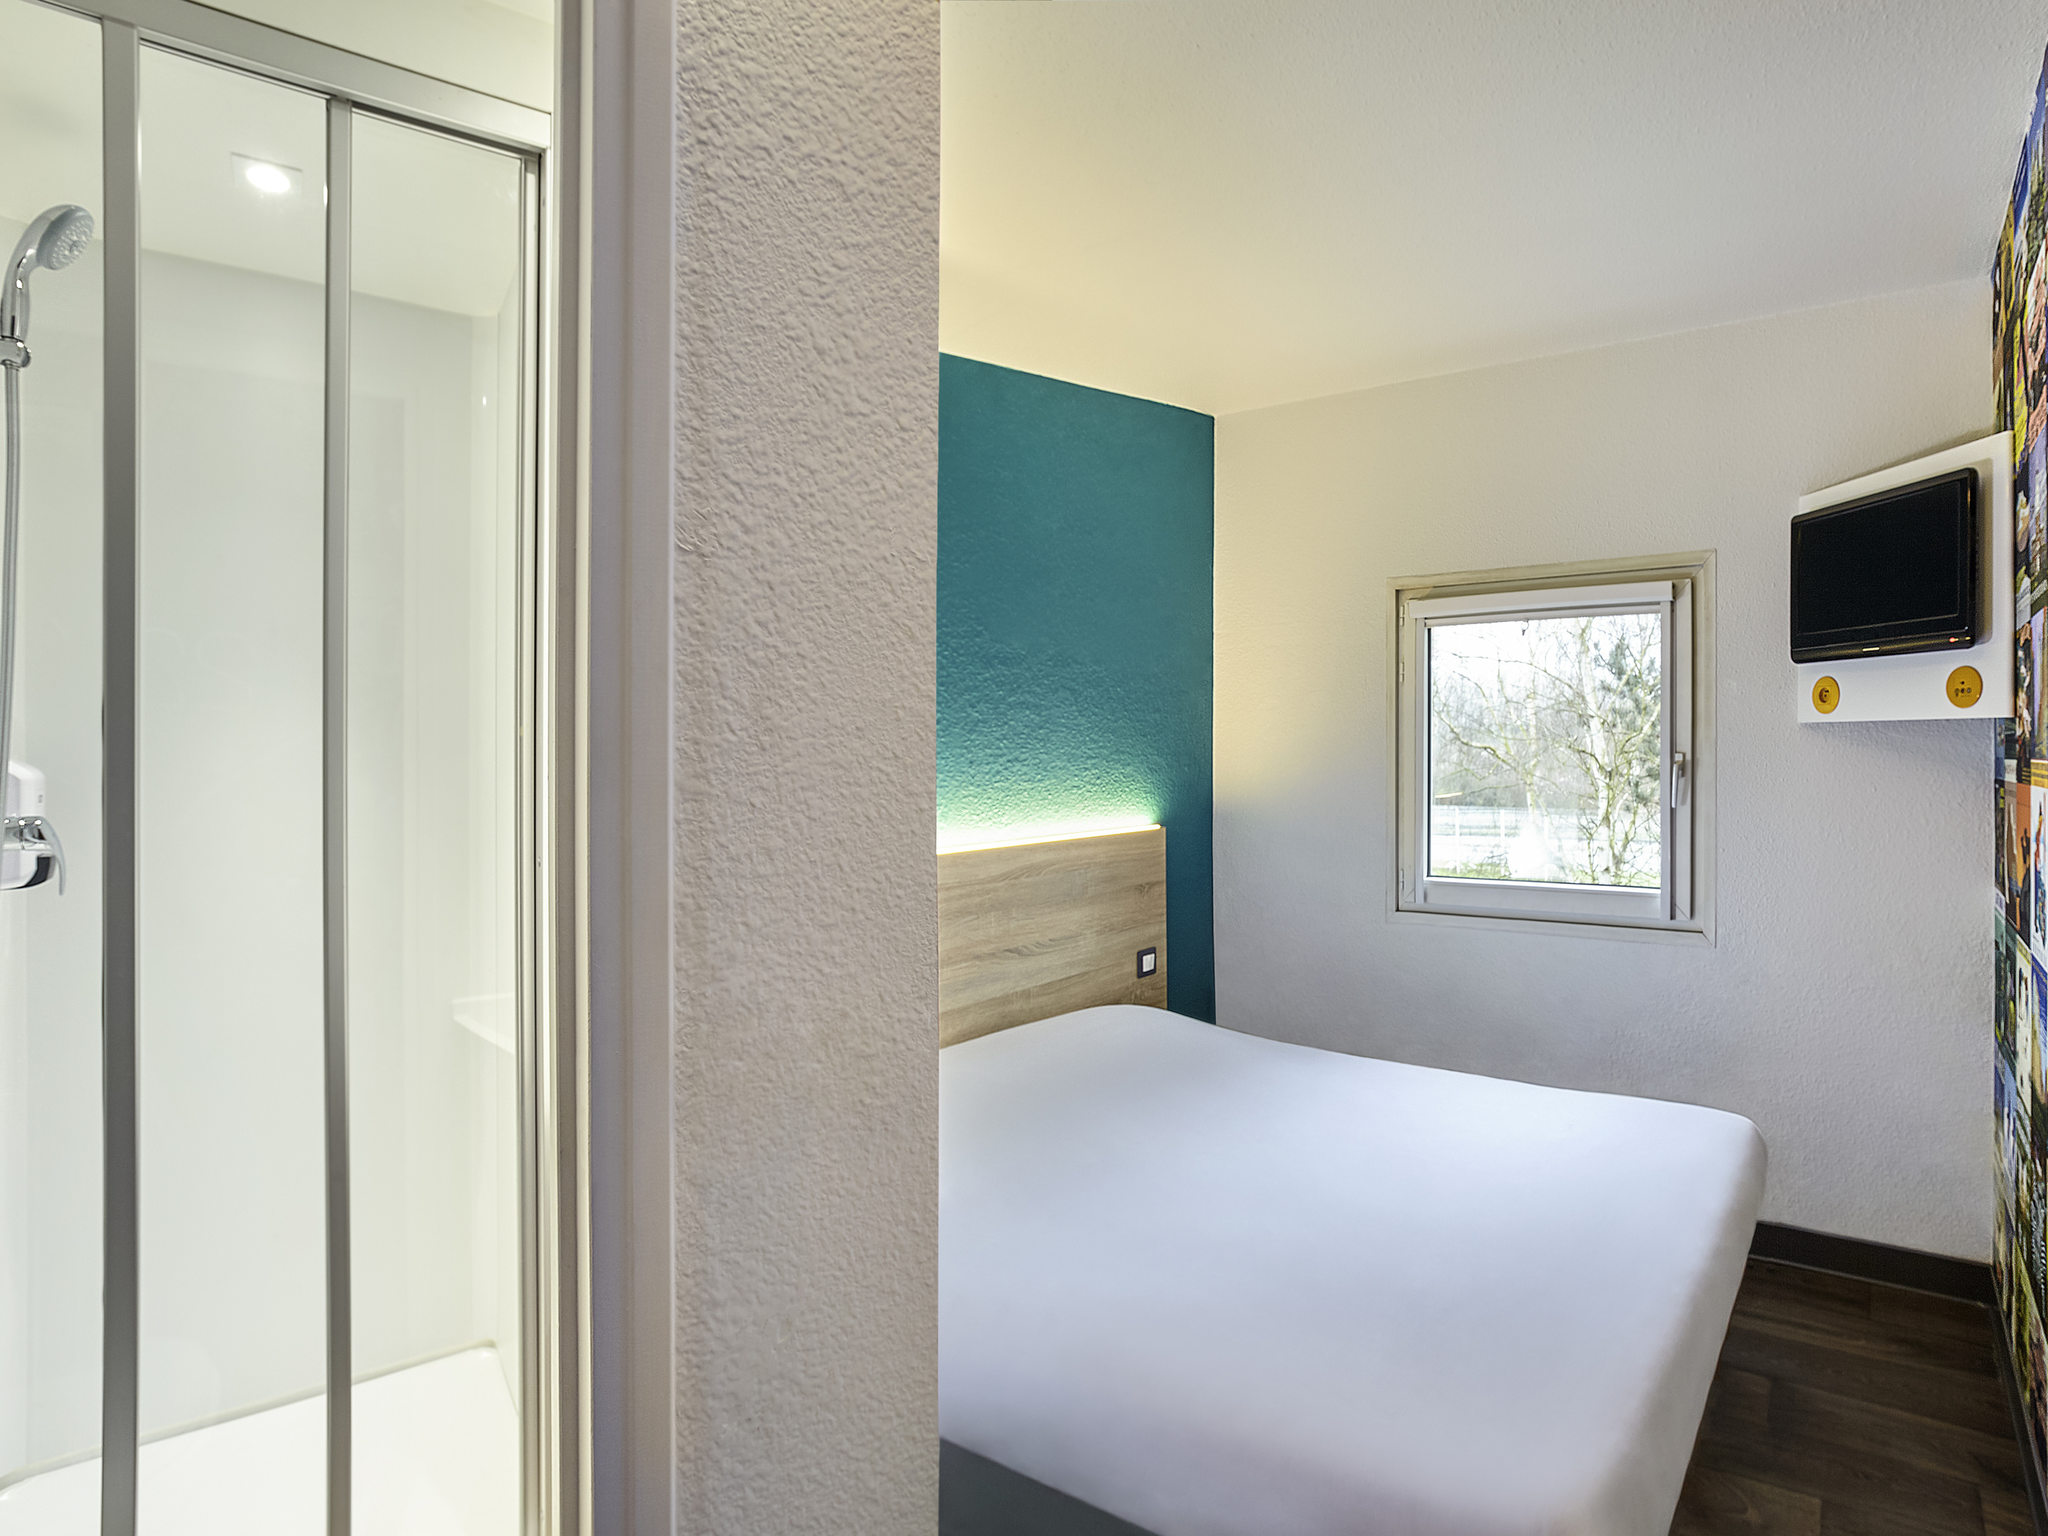 Hotel - hotelF1 Paris Porte de Montreuil